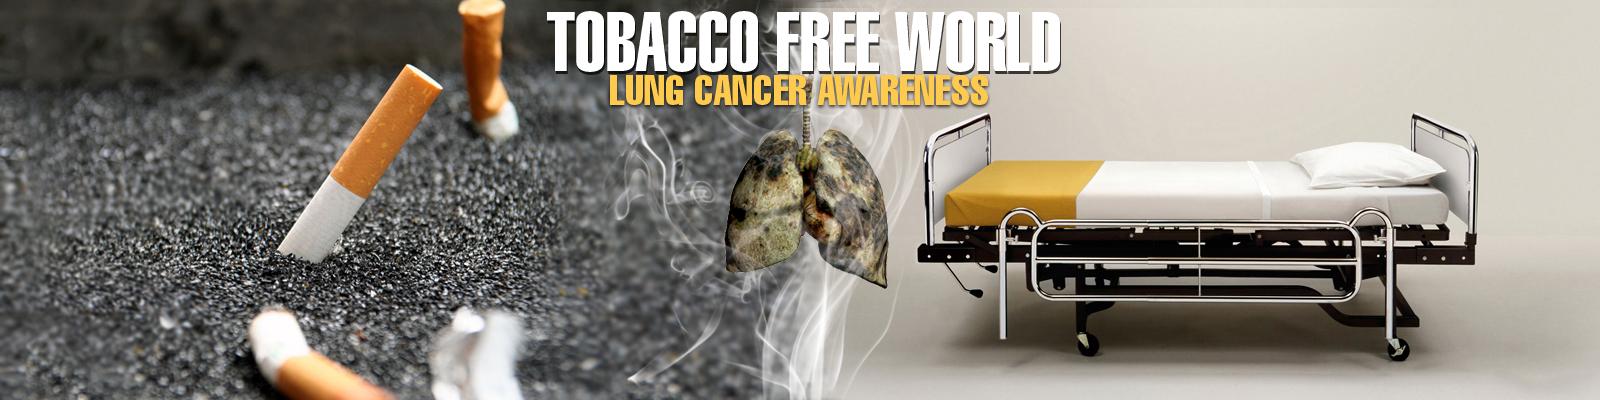 TobaccoFreeWorld.info